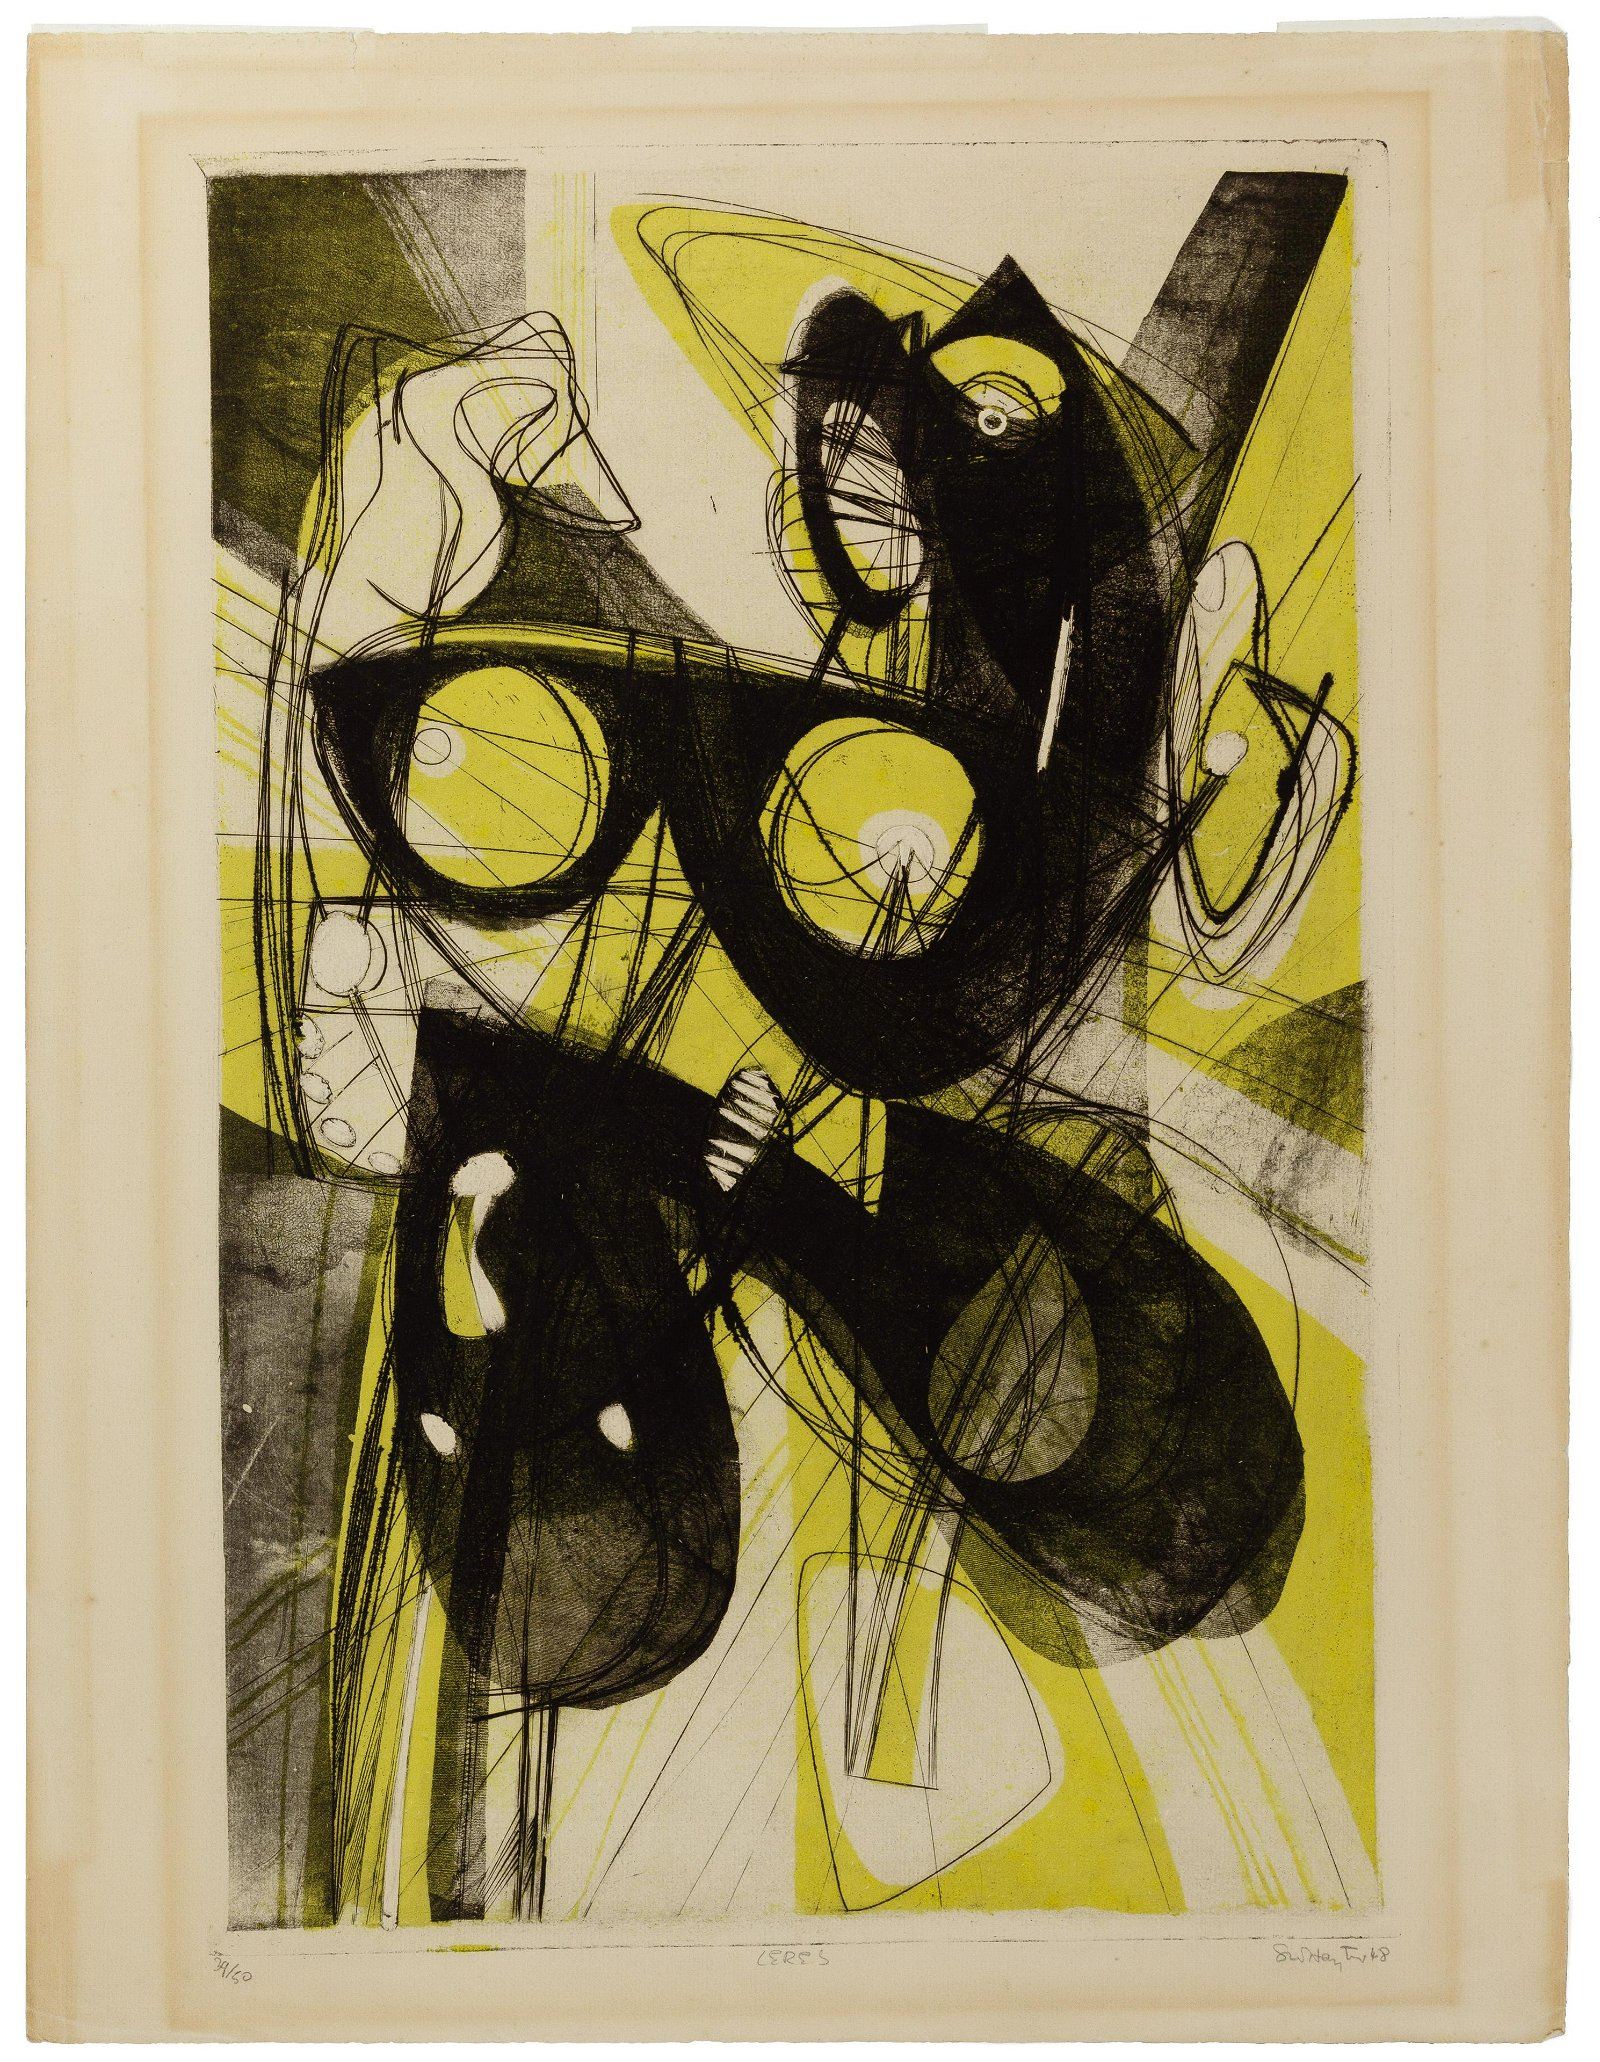 Stanley William Hayter (American, 1901-1988) 'Ceres'